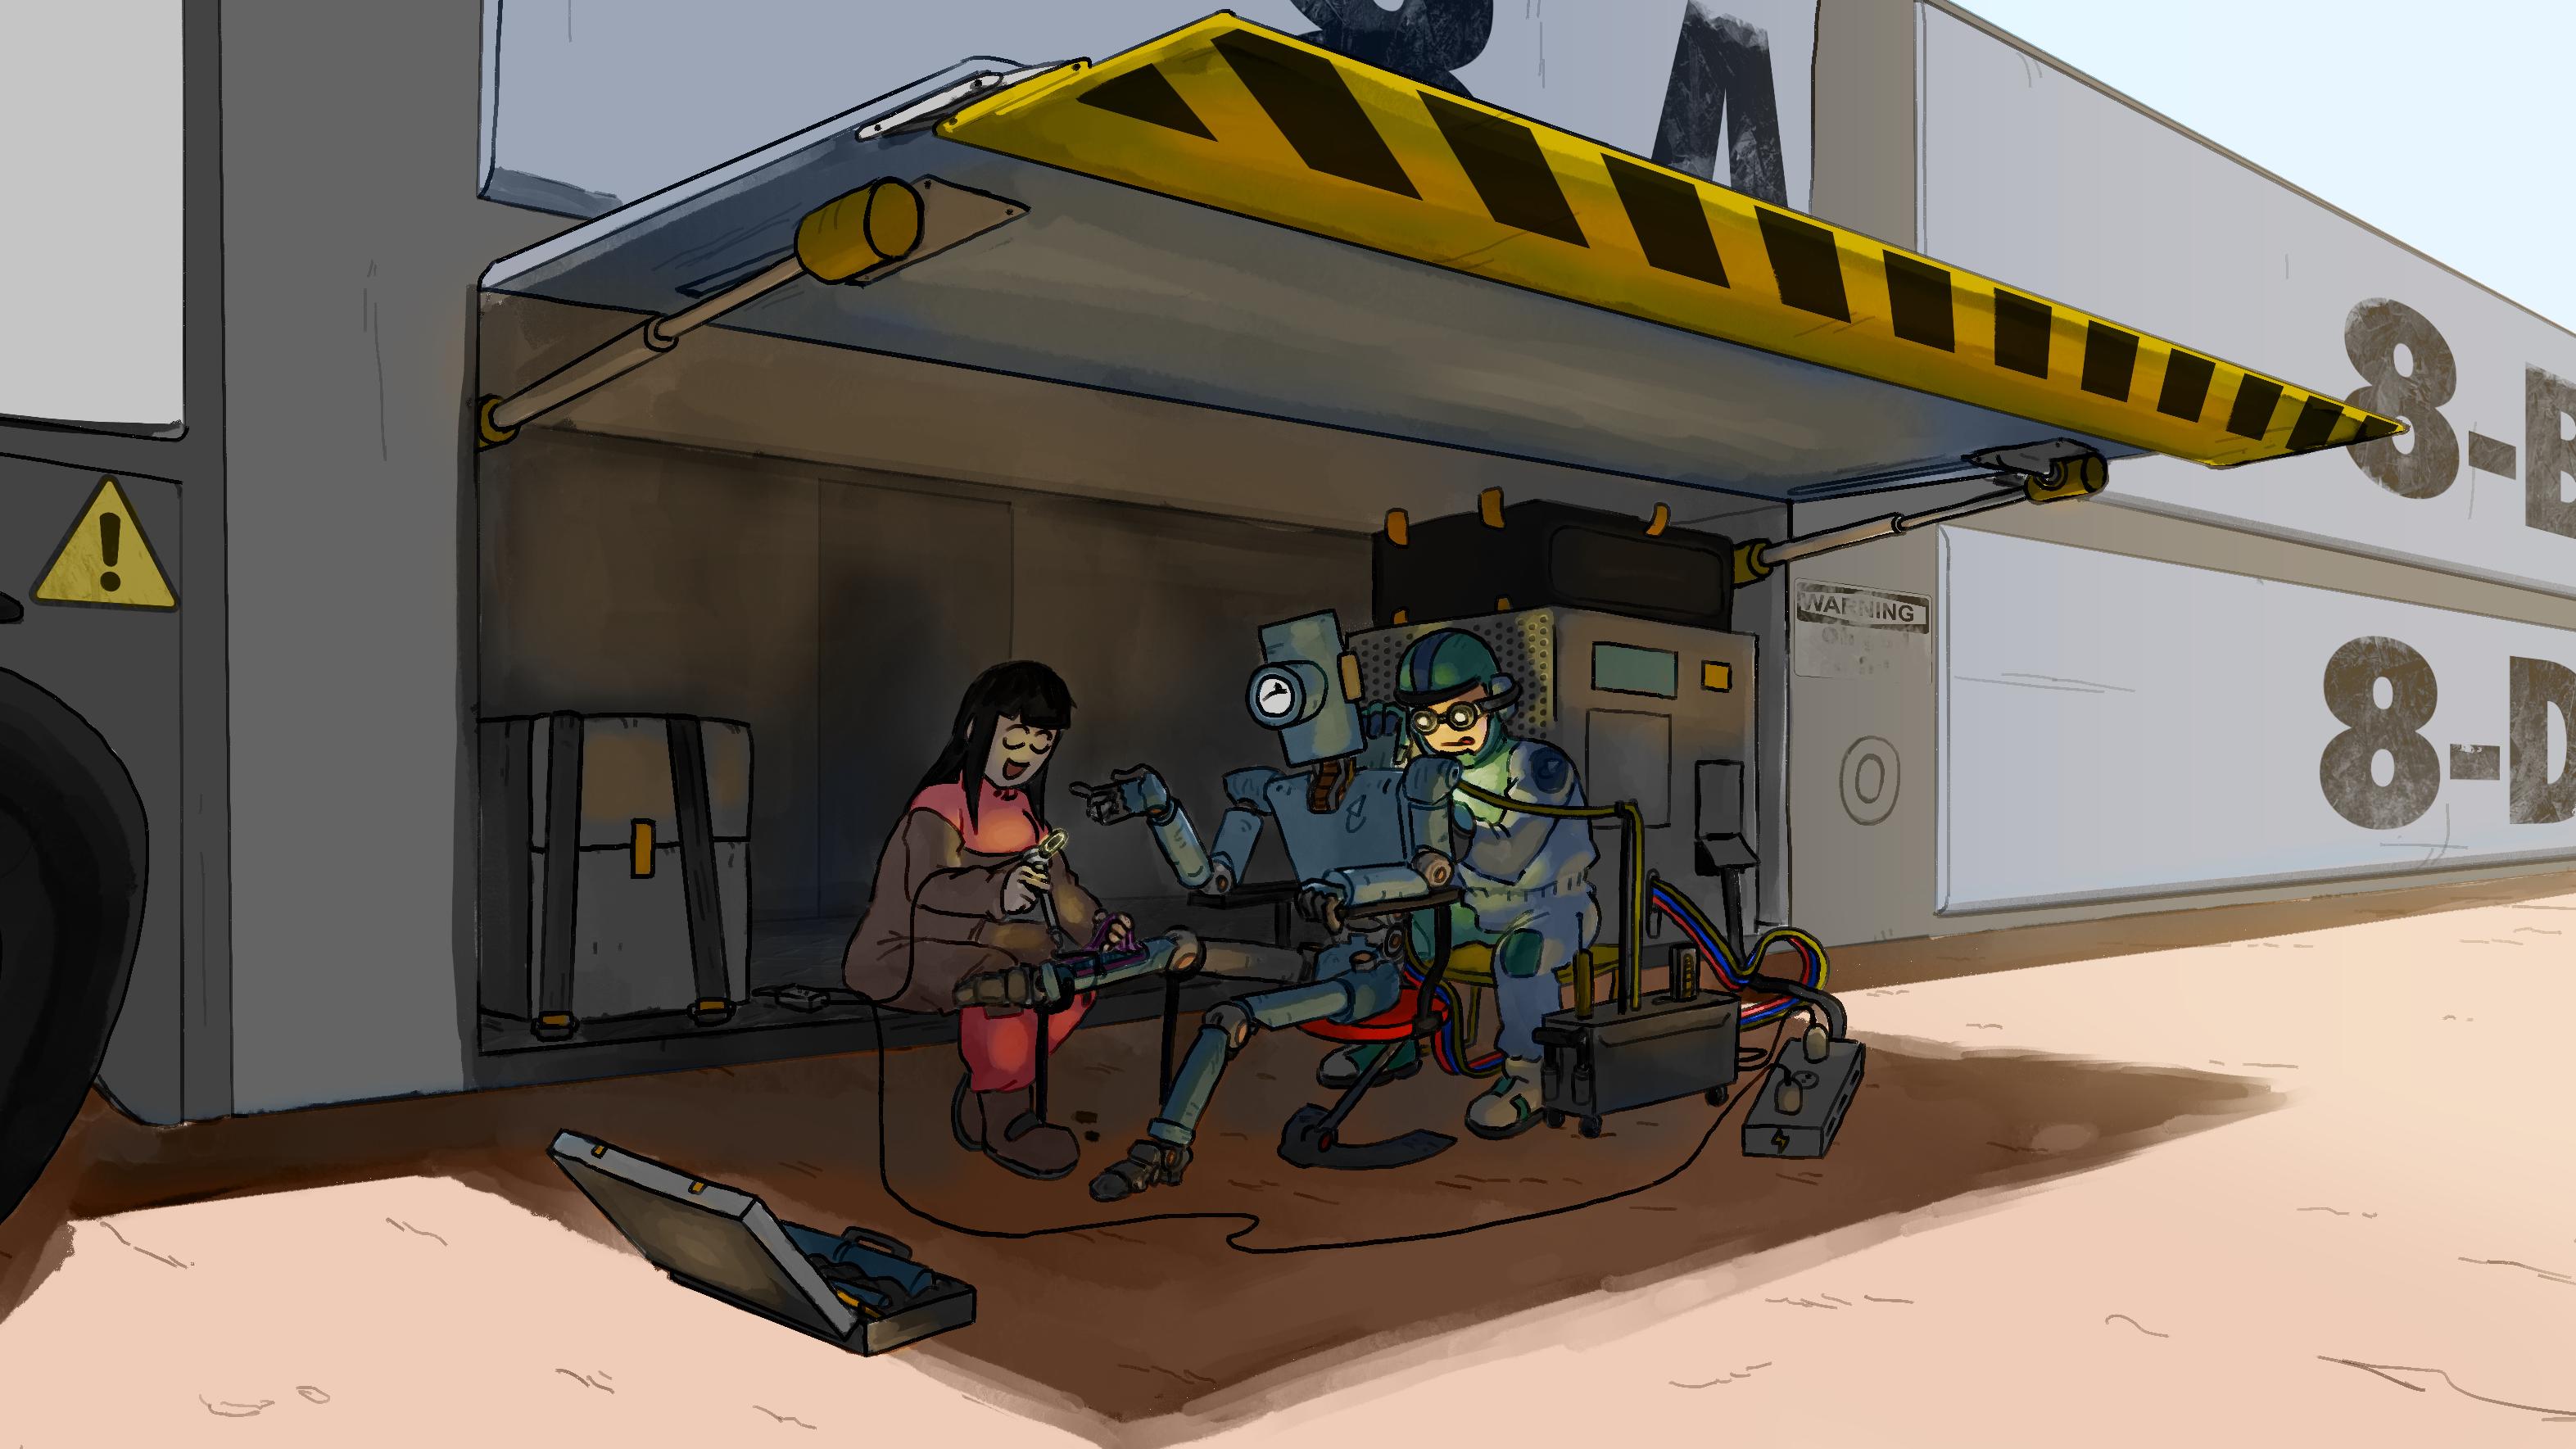 Midday maintenance